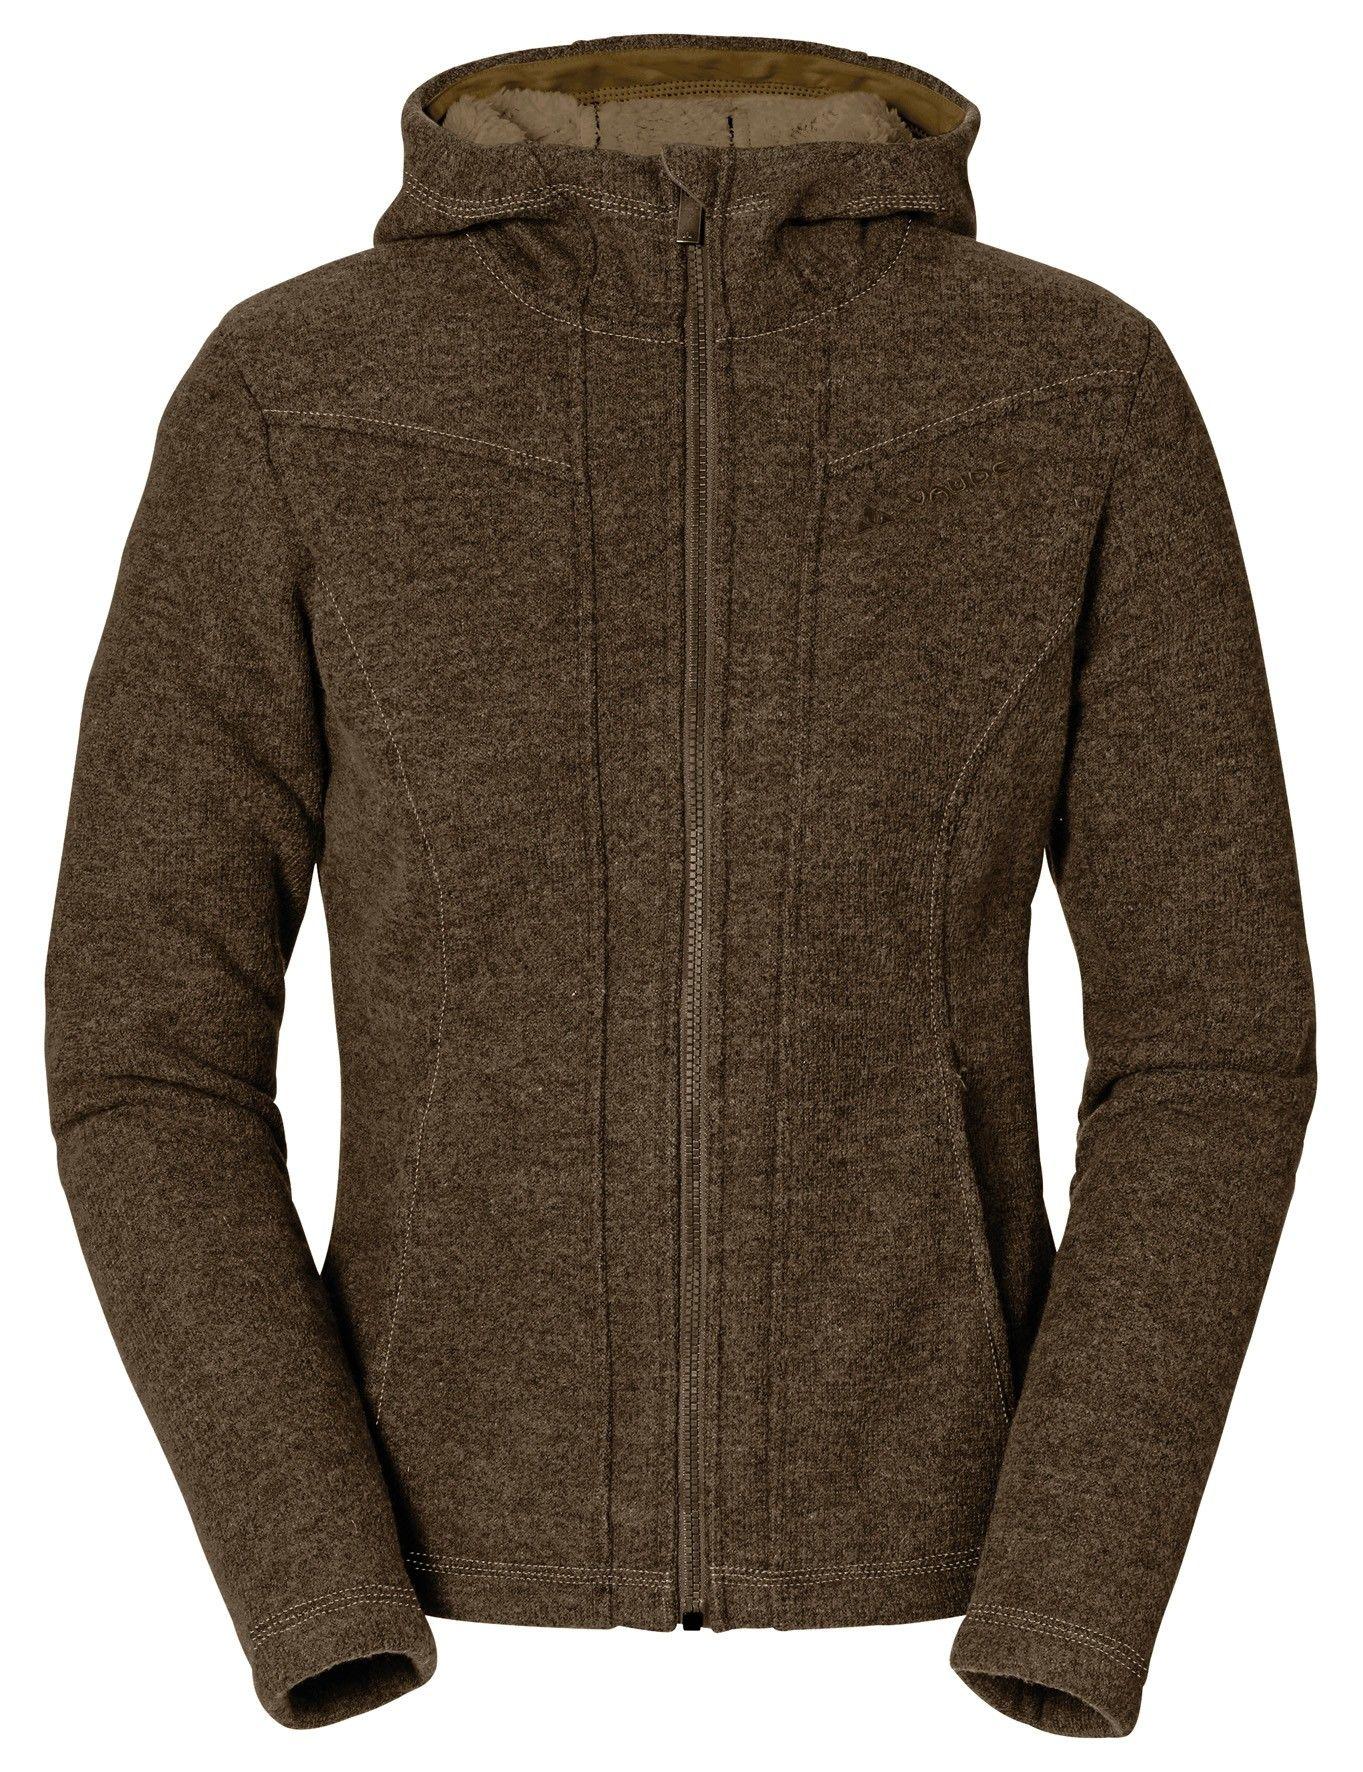 Vaude Womens Tinshan Hoody Jacket | Damen Fleecejacke